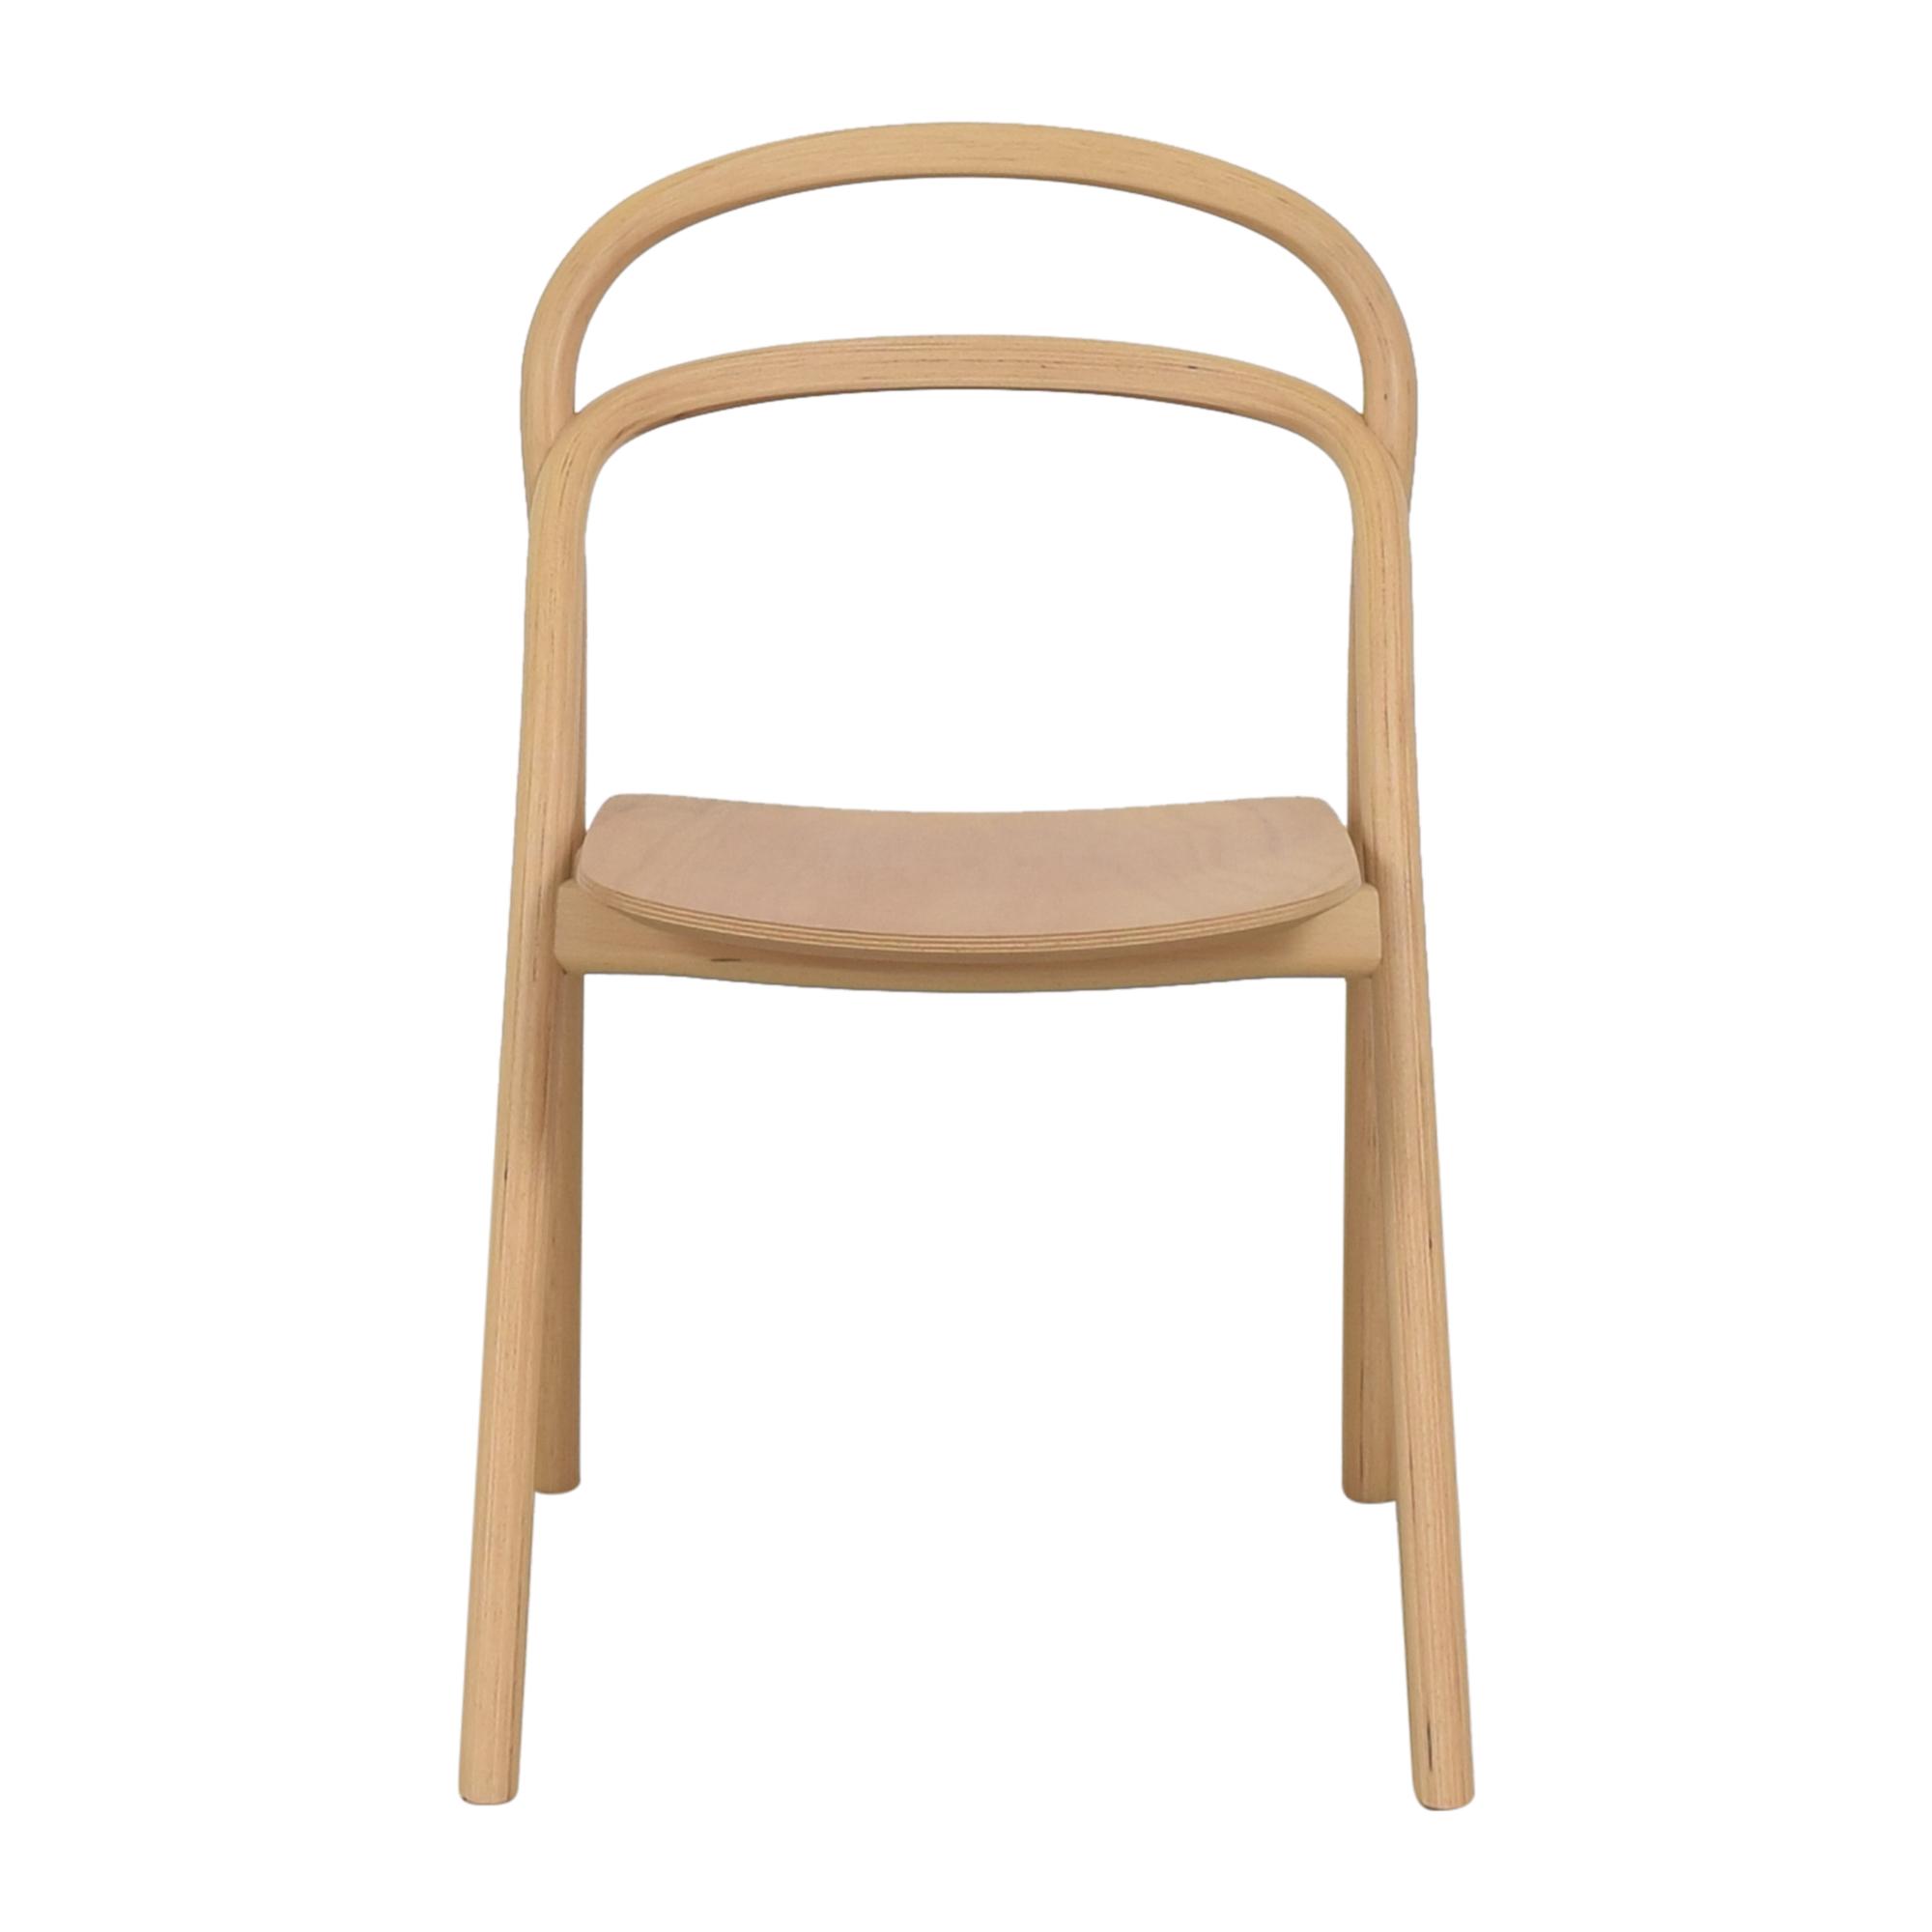 Hem HEM Udon Chair for sale